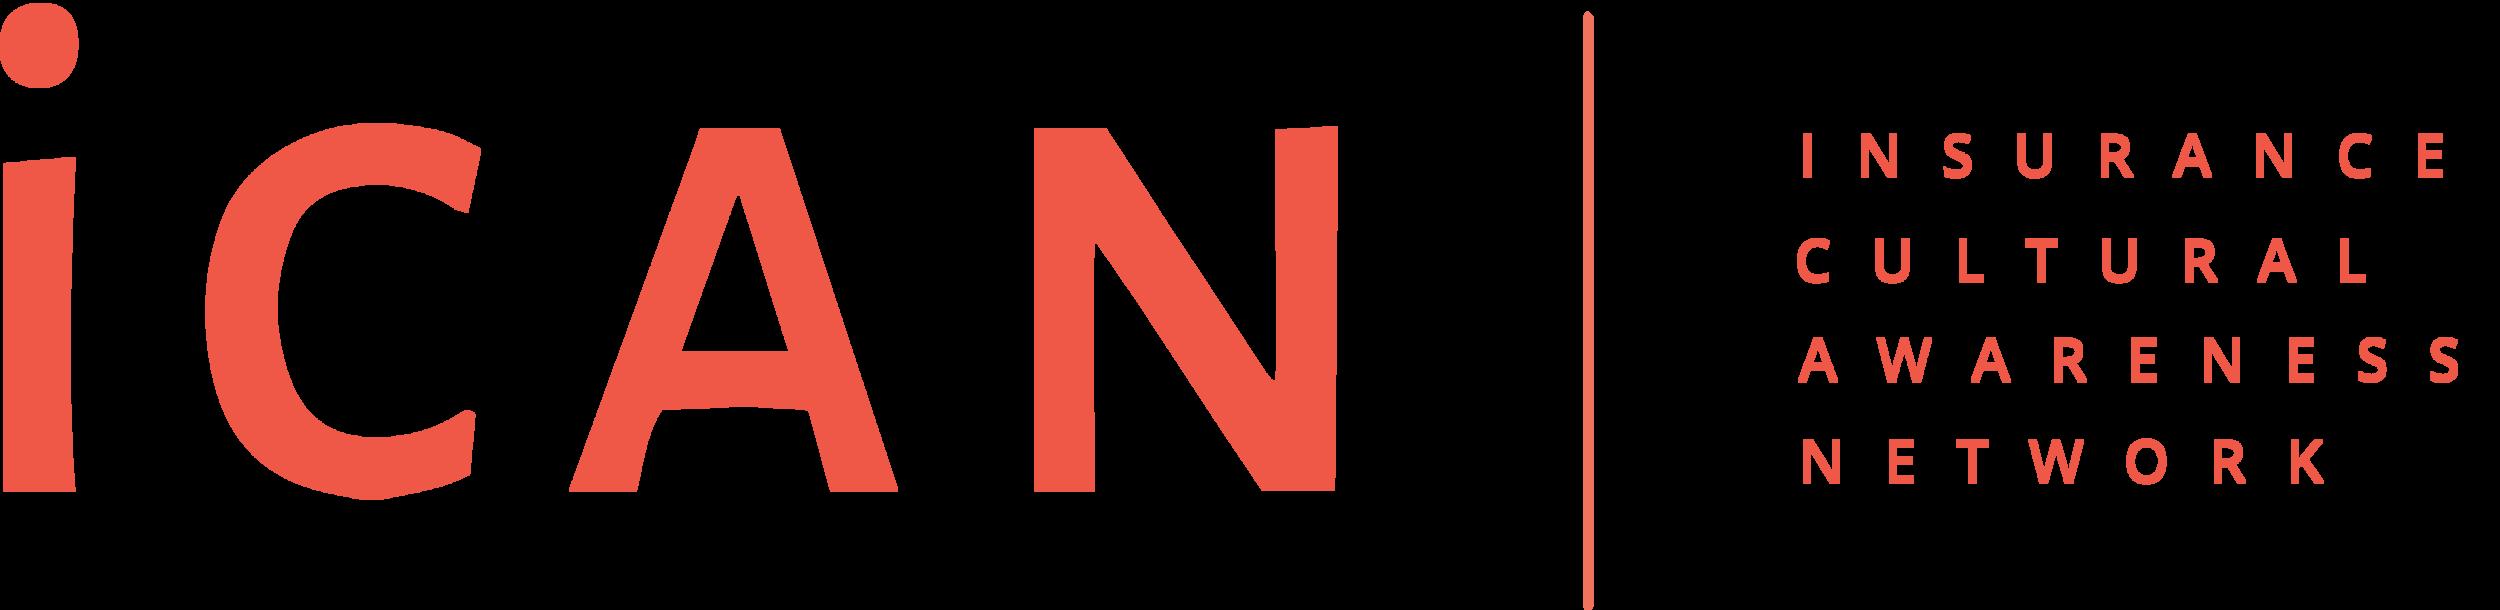 ican-logo-002.png